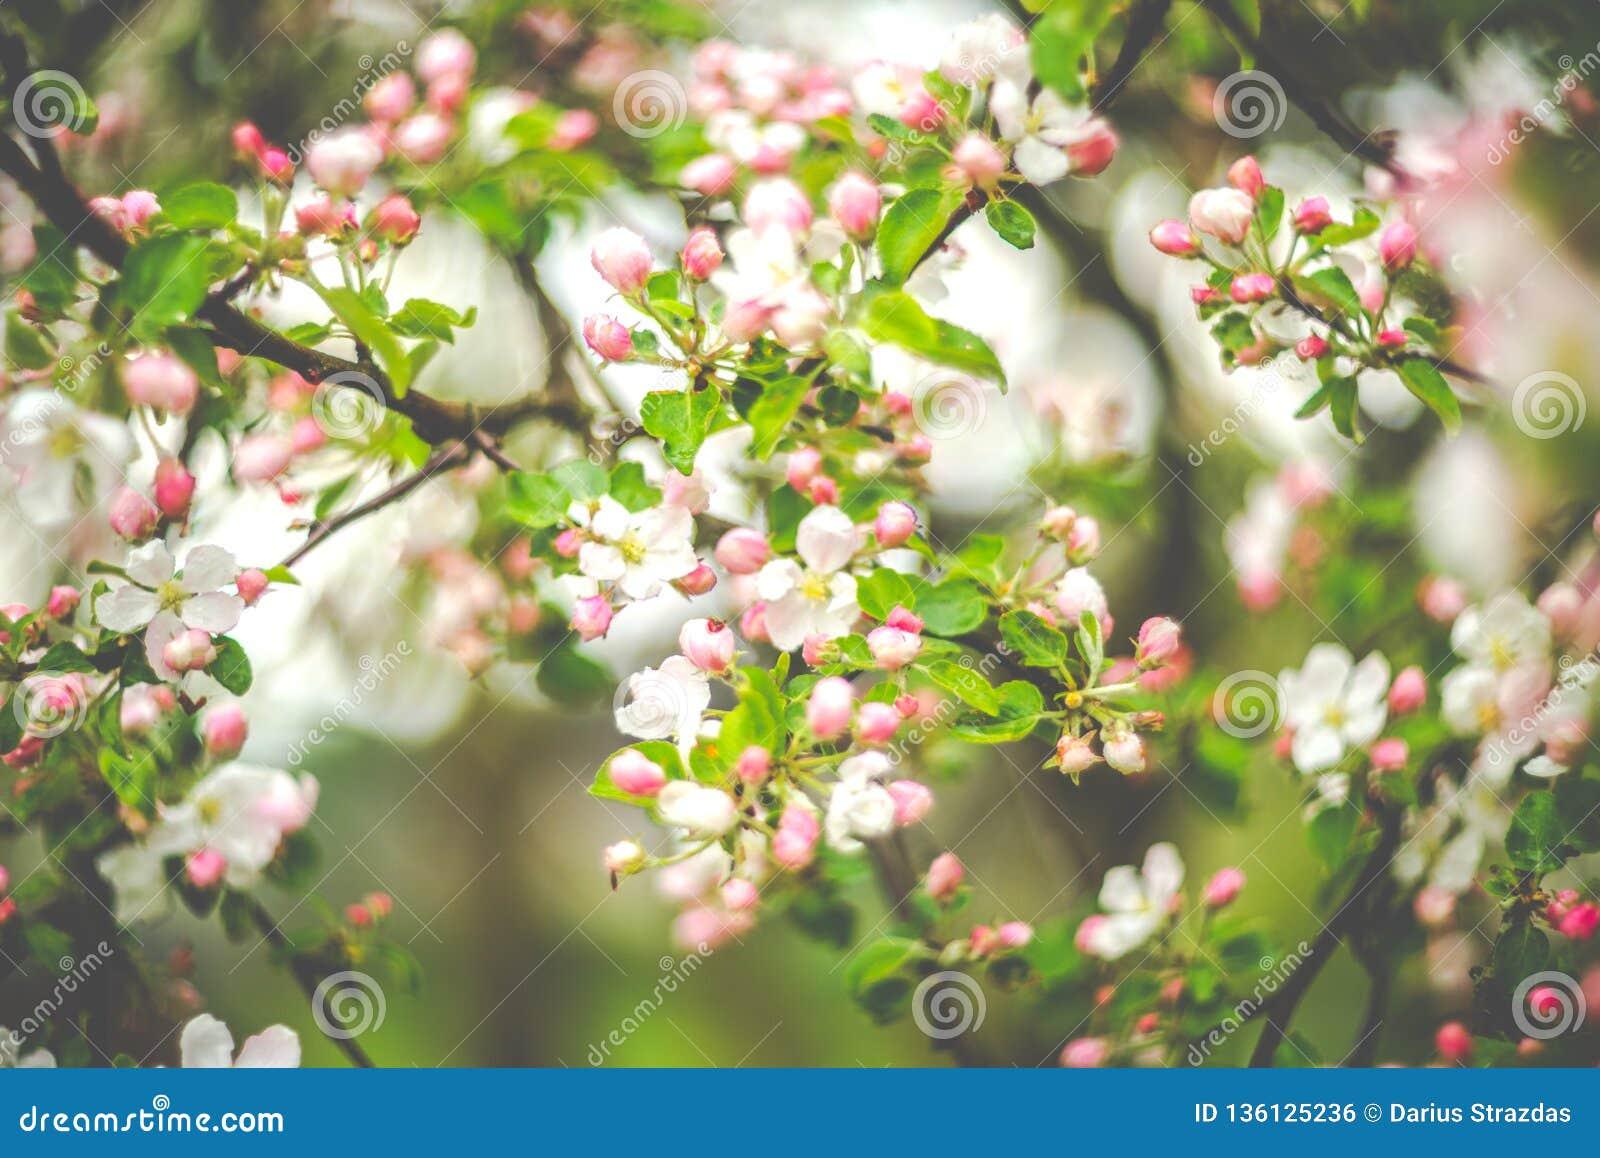 Spring blooming in pink